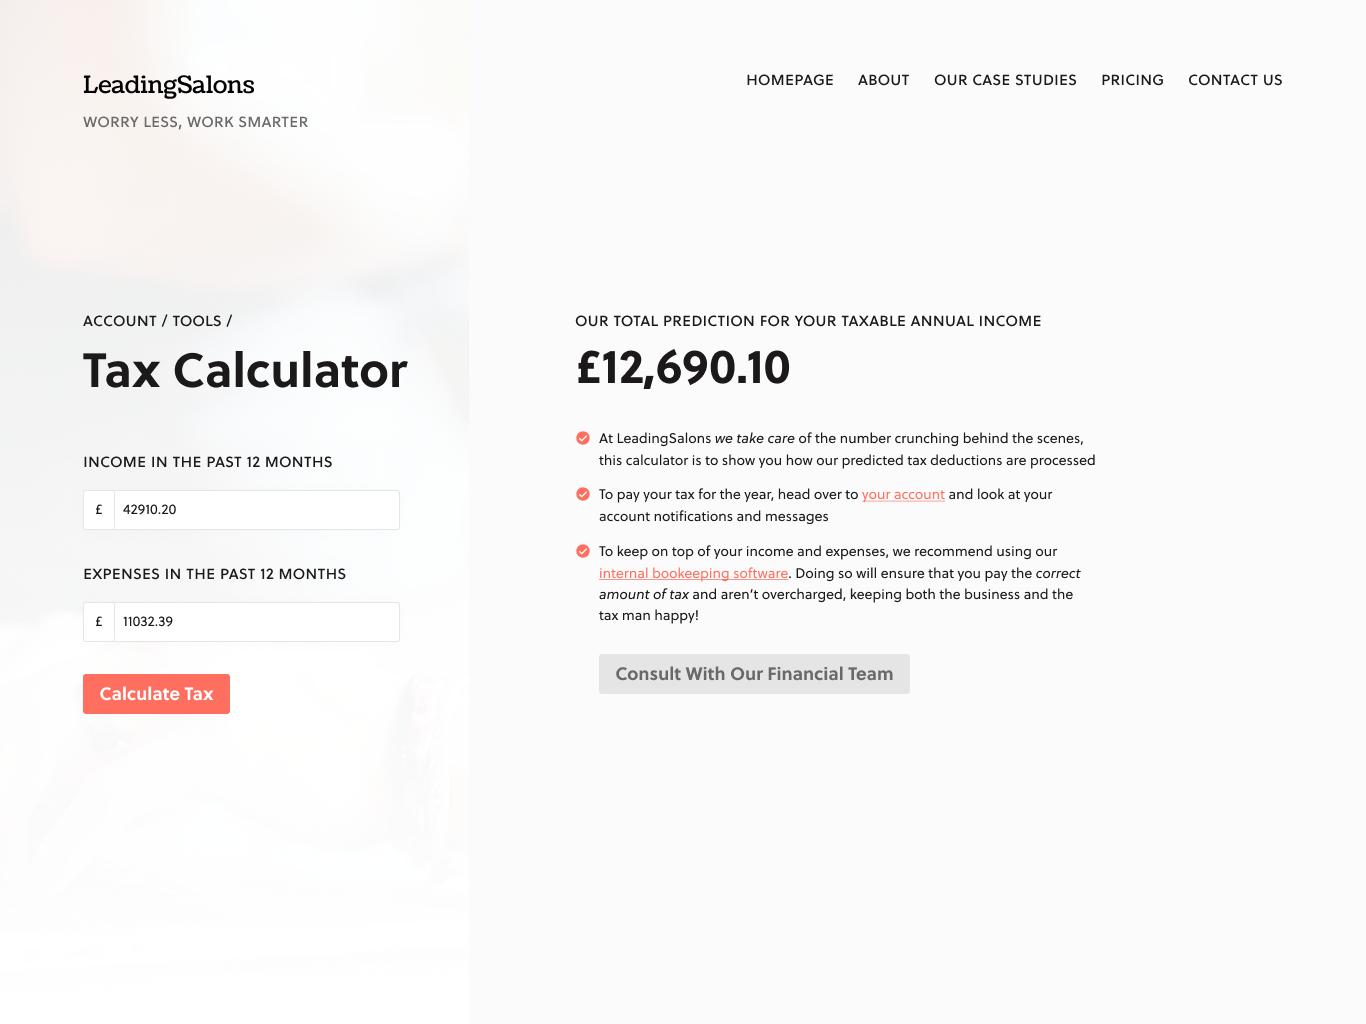 Tax Calculator tax calculator calculator ui calculator app user interface calculator